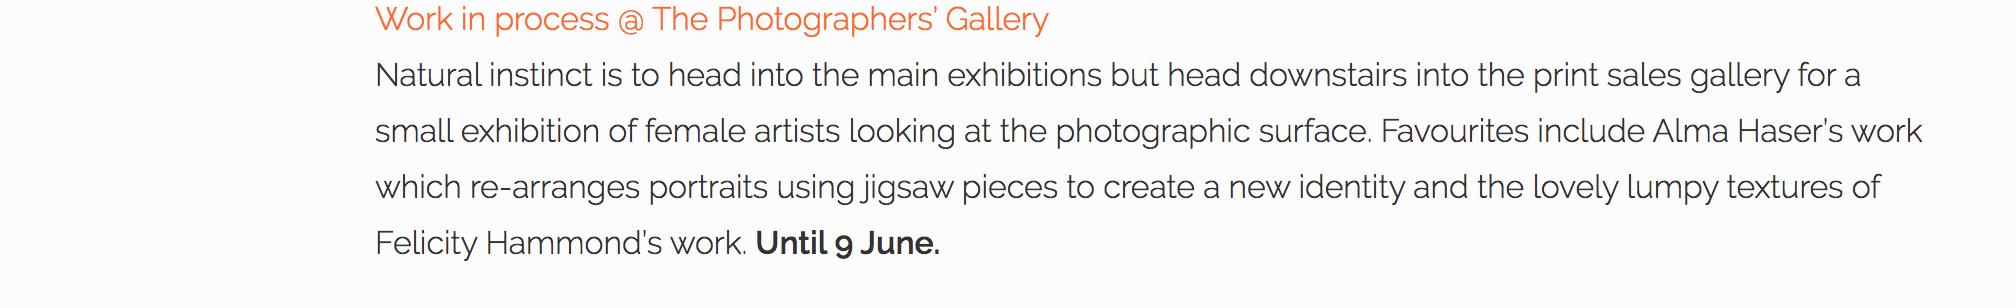 https://fadmagazine.com/2018/05/27/top-7-art-exhibitions-see-london-week-270518/